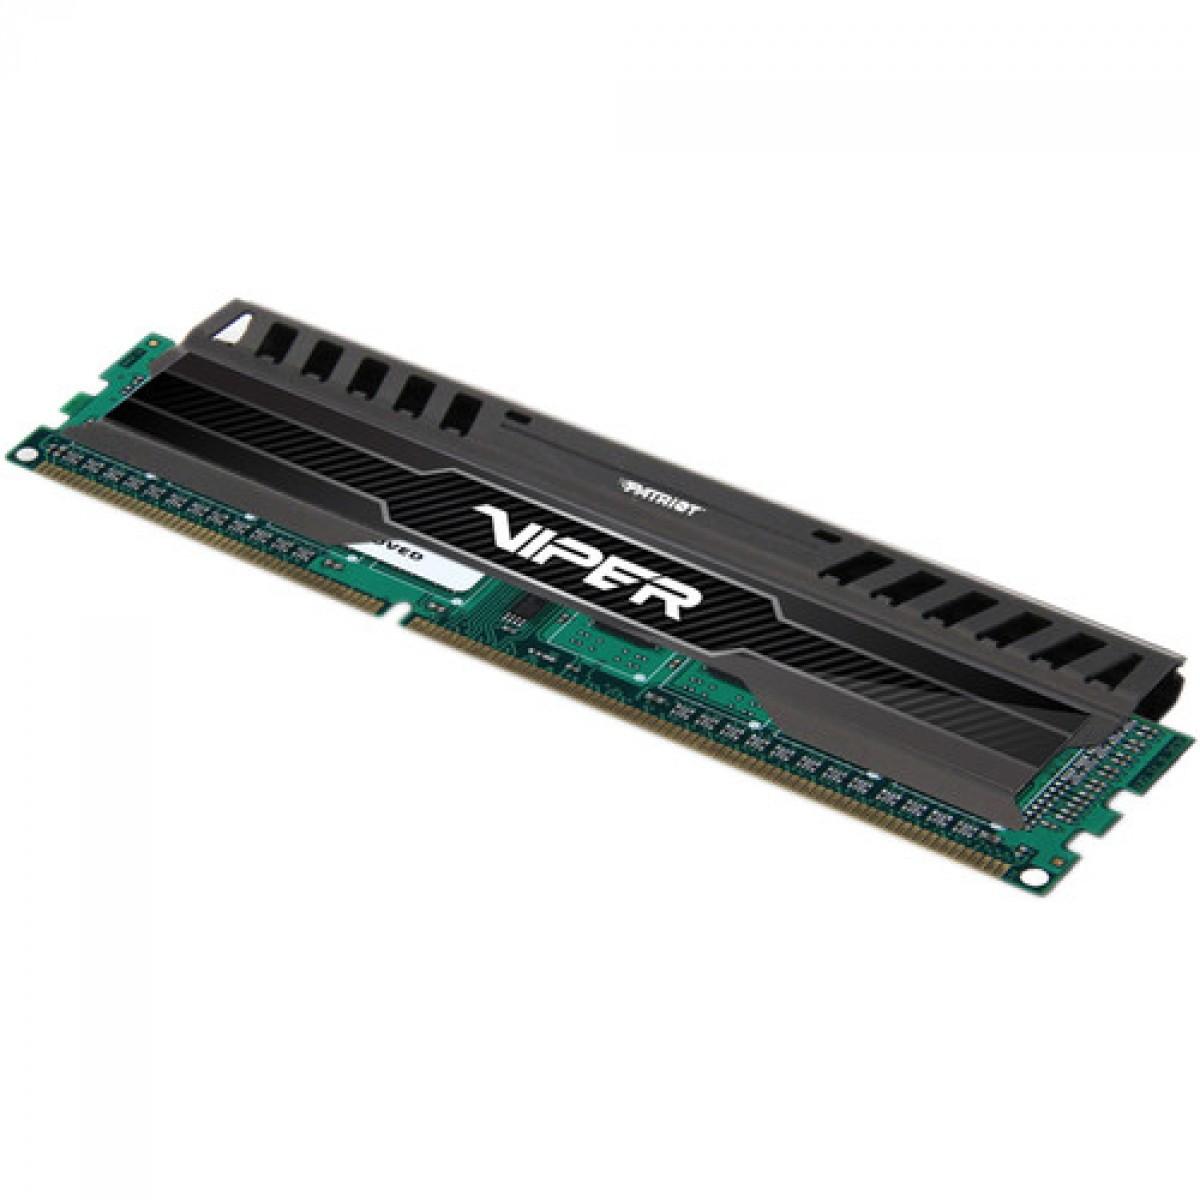 Memória DDR3 Patriot Viper 3, 8GB 1600MHz, Black, PV38G160C0